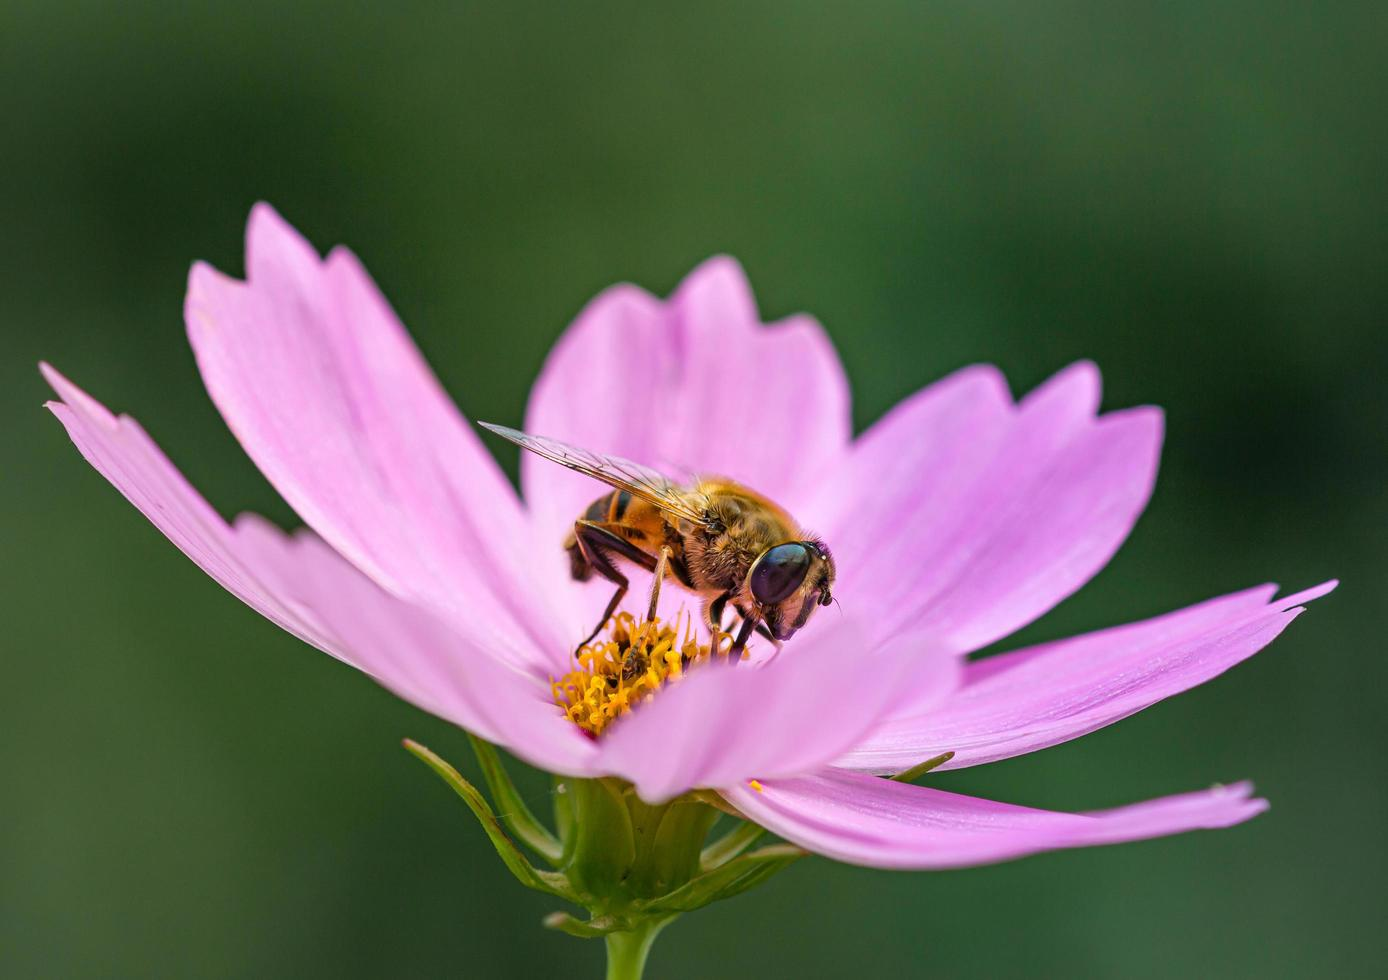 Biene auf lila Blume foto